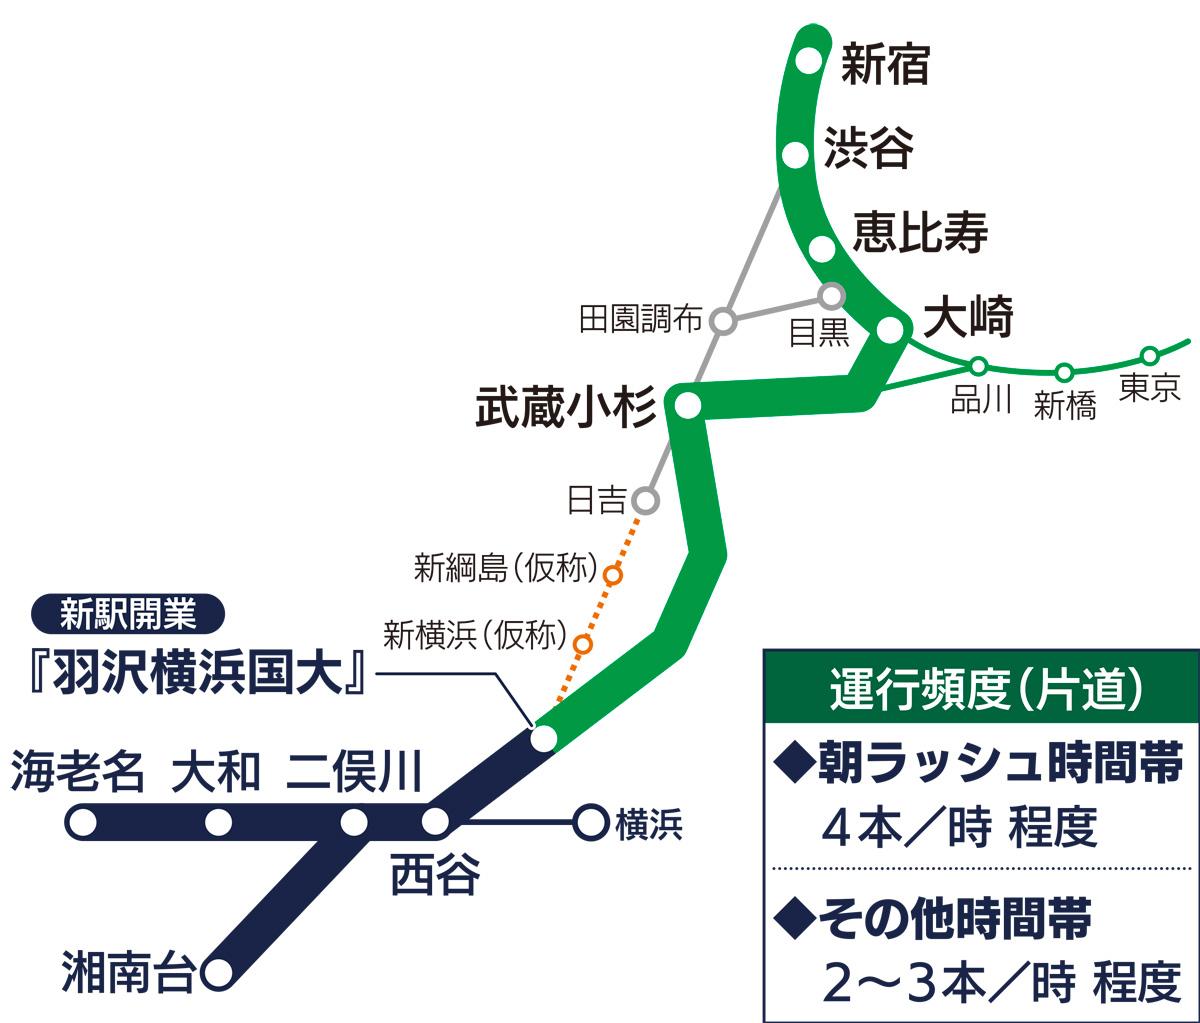 相鉄・JR直通線 11月30日に開業 ...